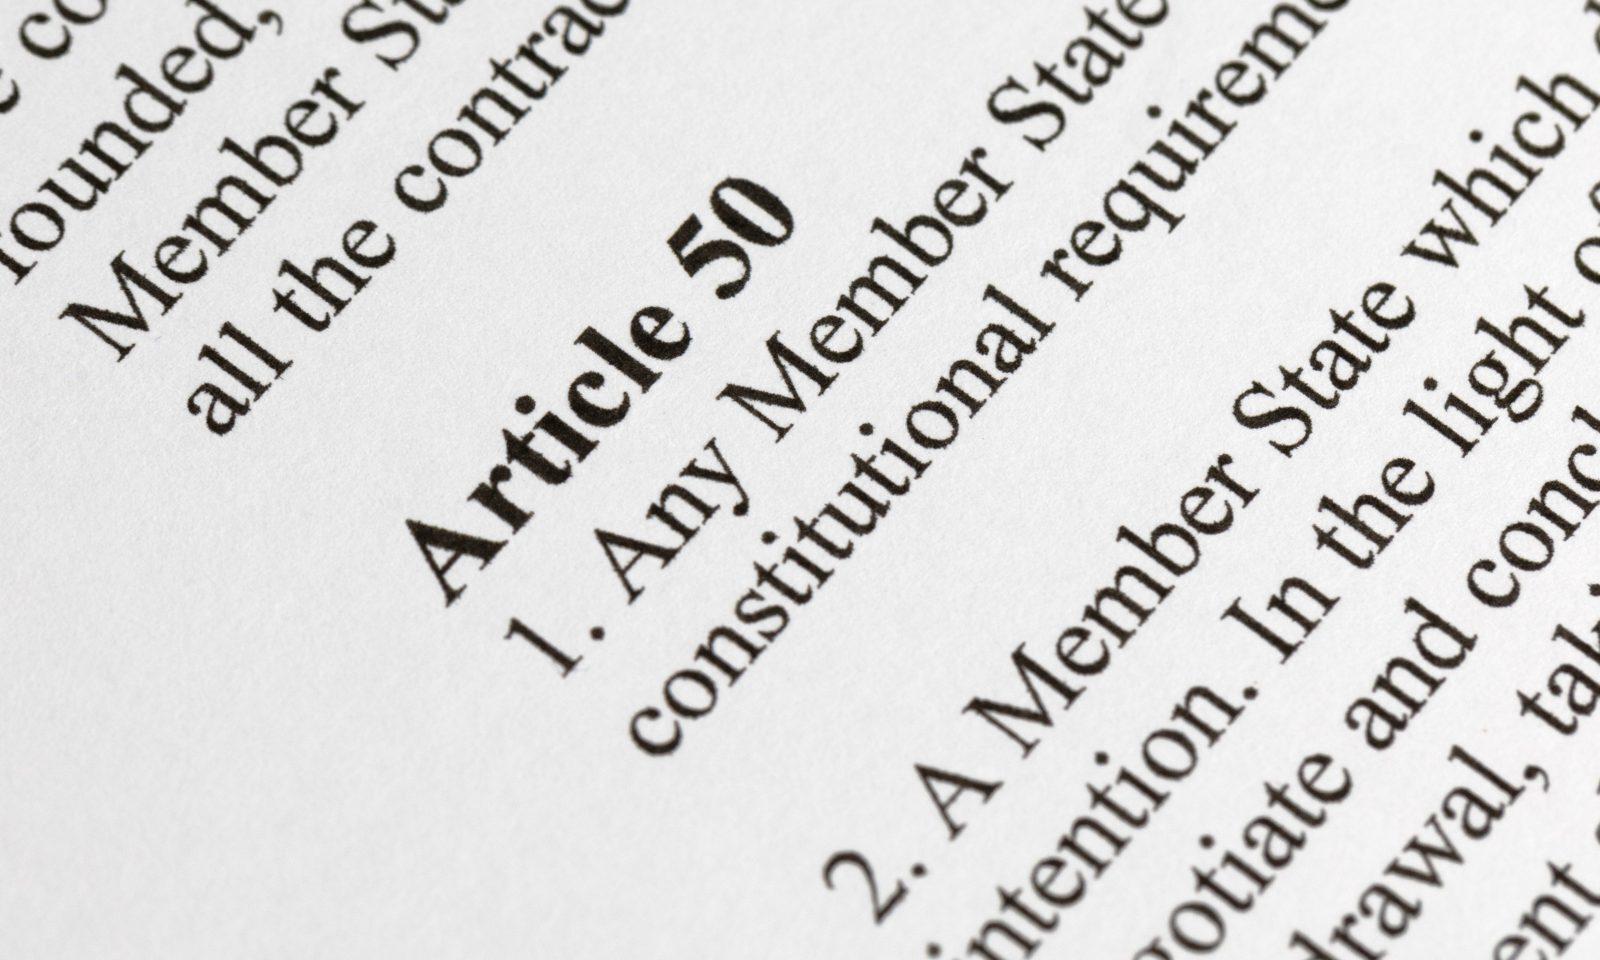 UK retail sales figures boost sterling in week before Article 50 is triggered